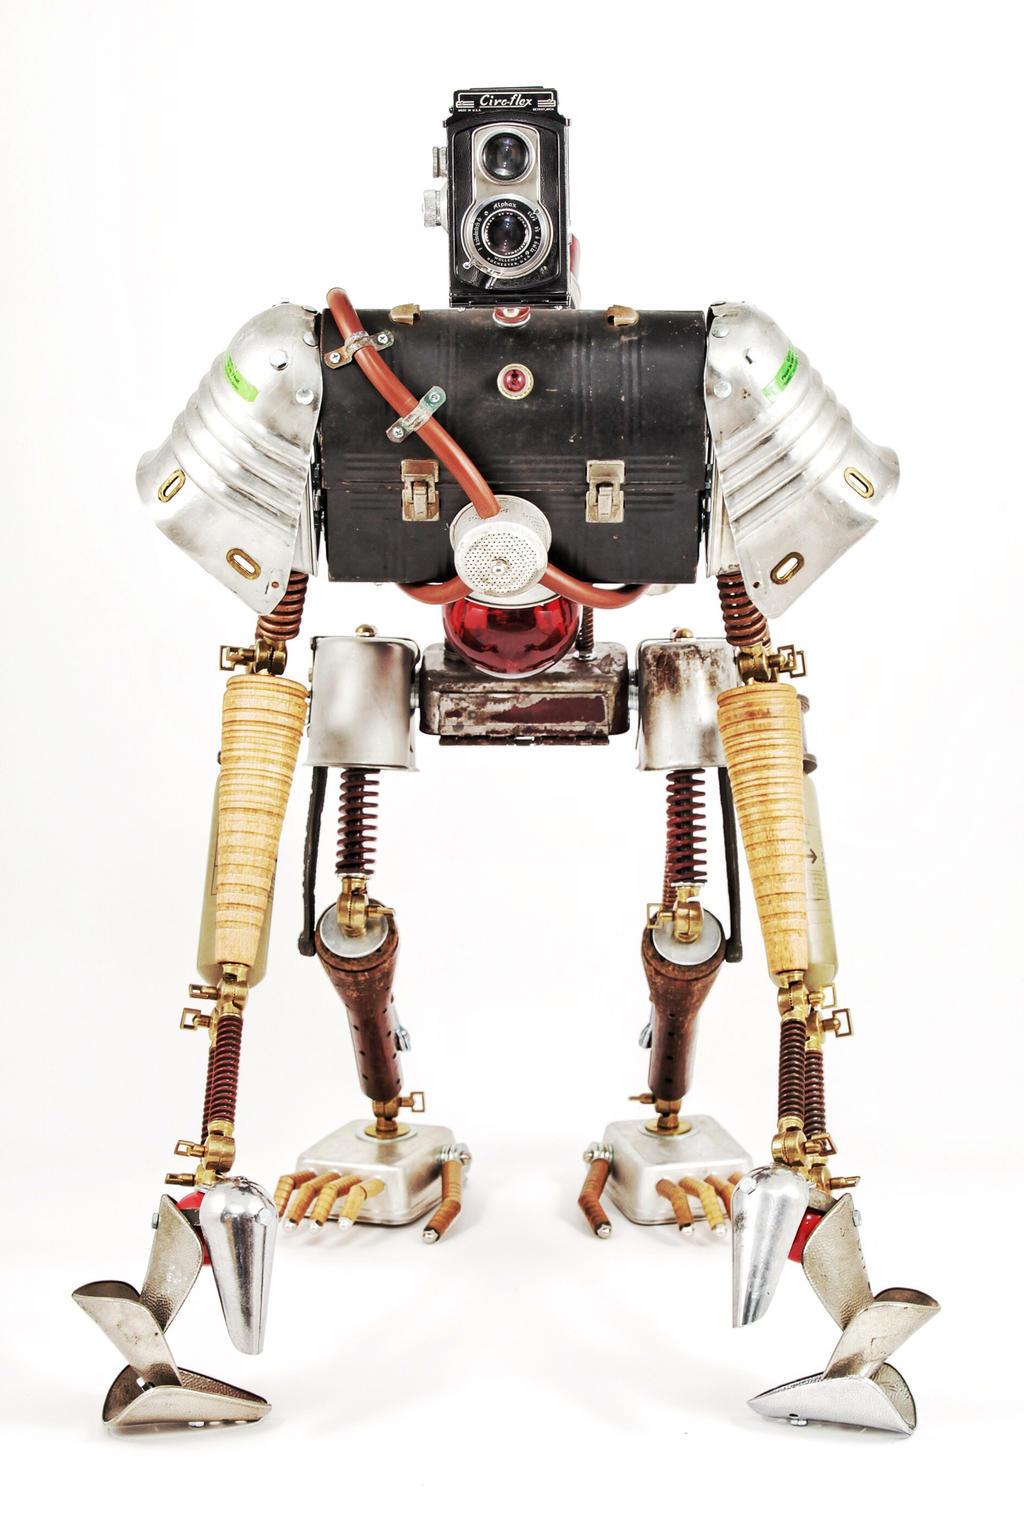 Duncan - Found object robot assemblage sculpture